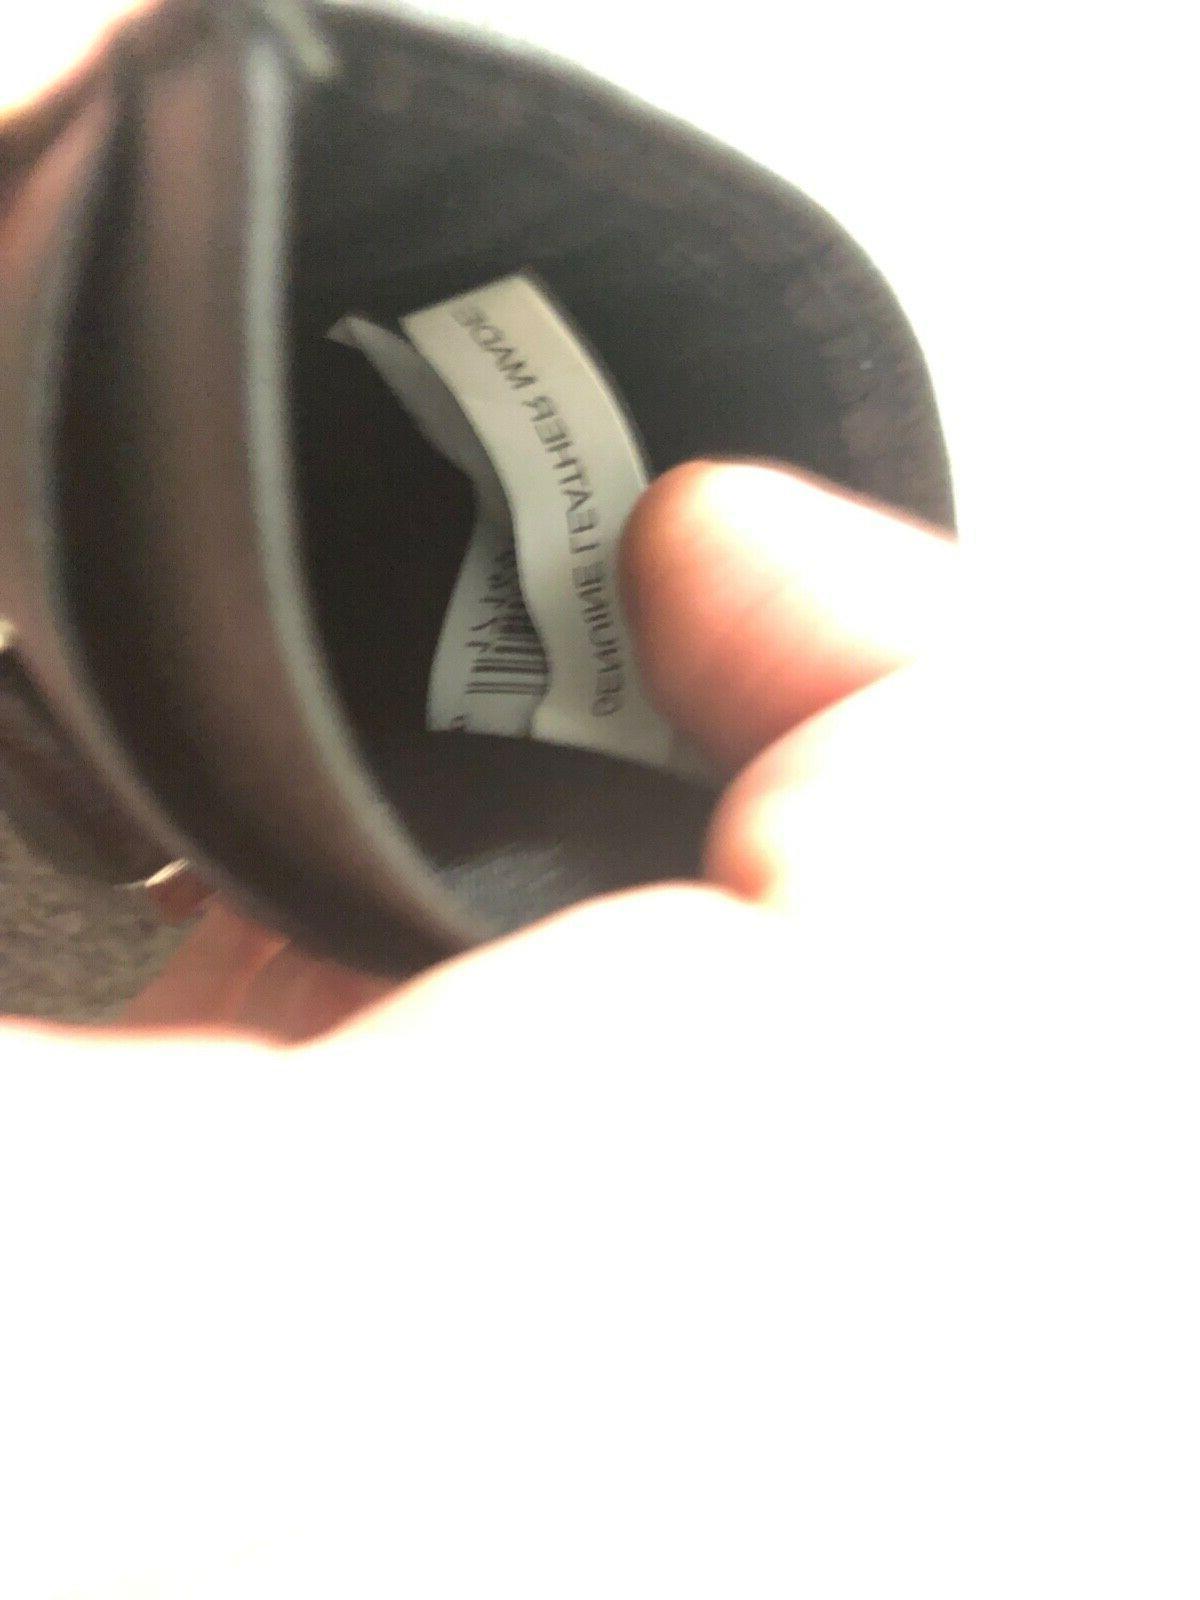 NEW Genuine Money Clip ID Sleeve